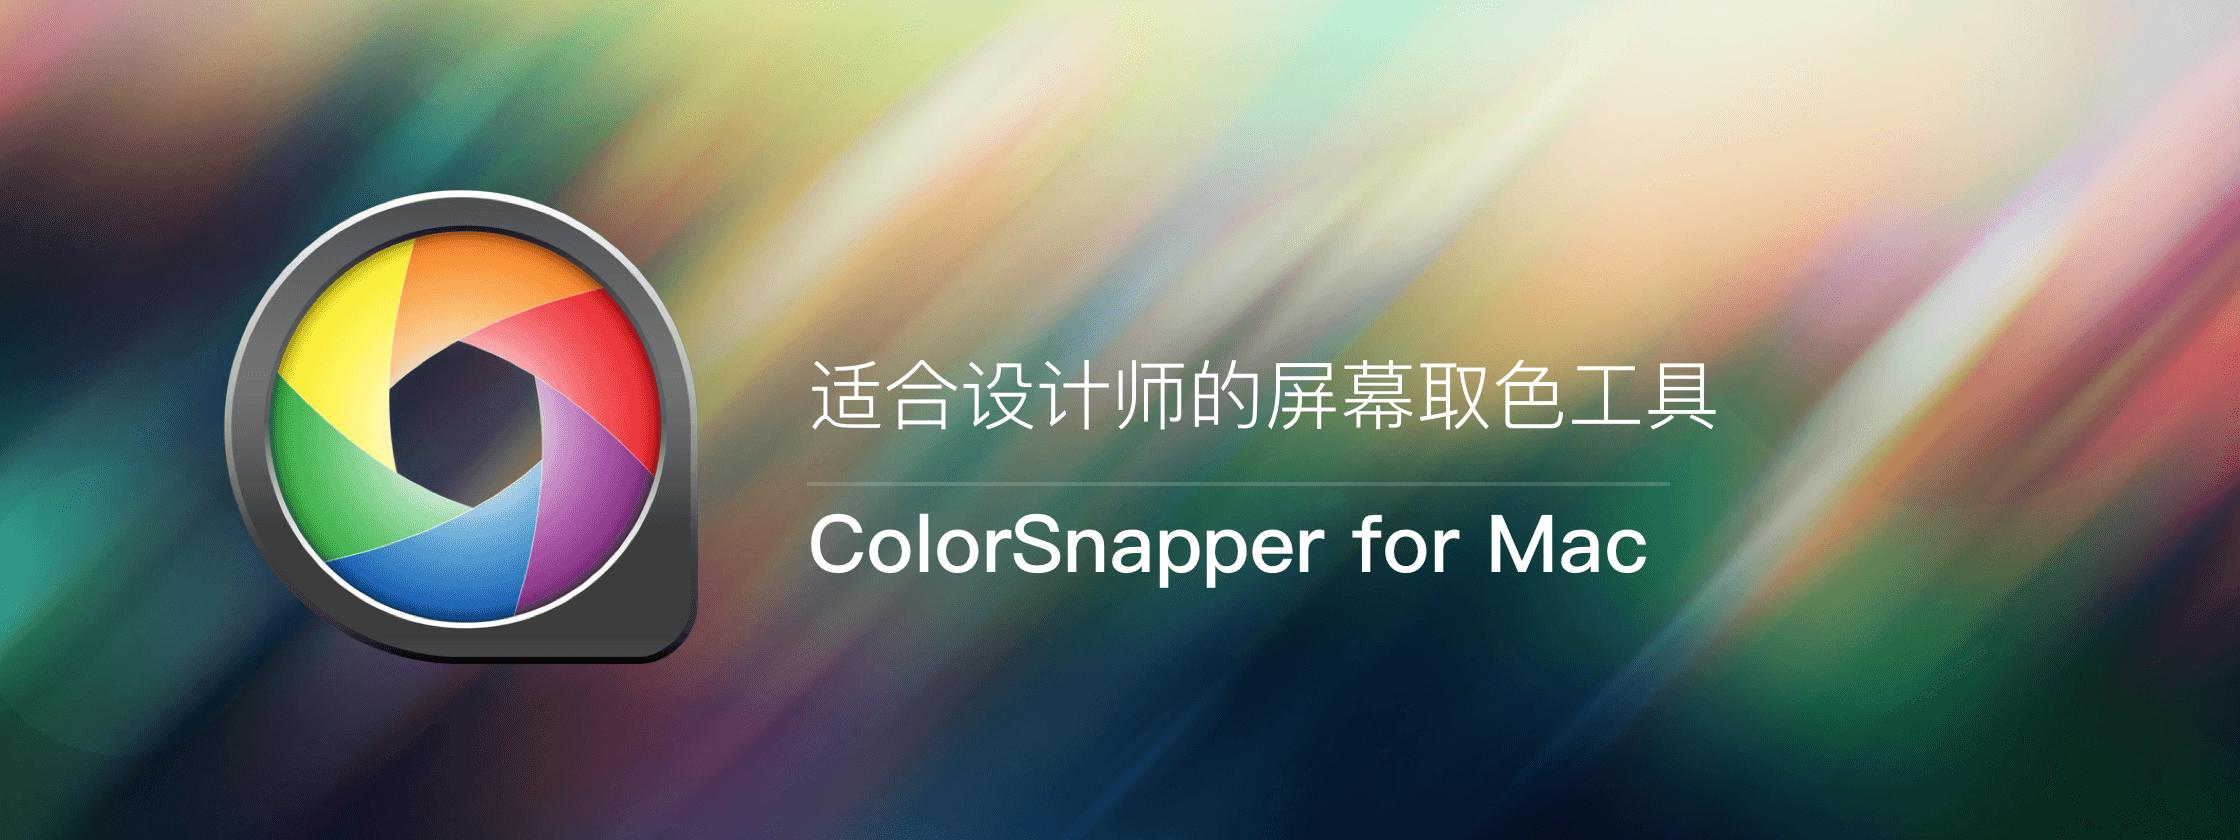 ColorSnapper for Mac – 适合设计师的屏幕取色工具